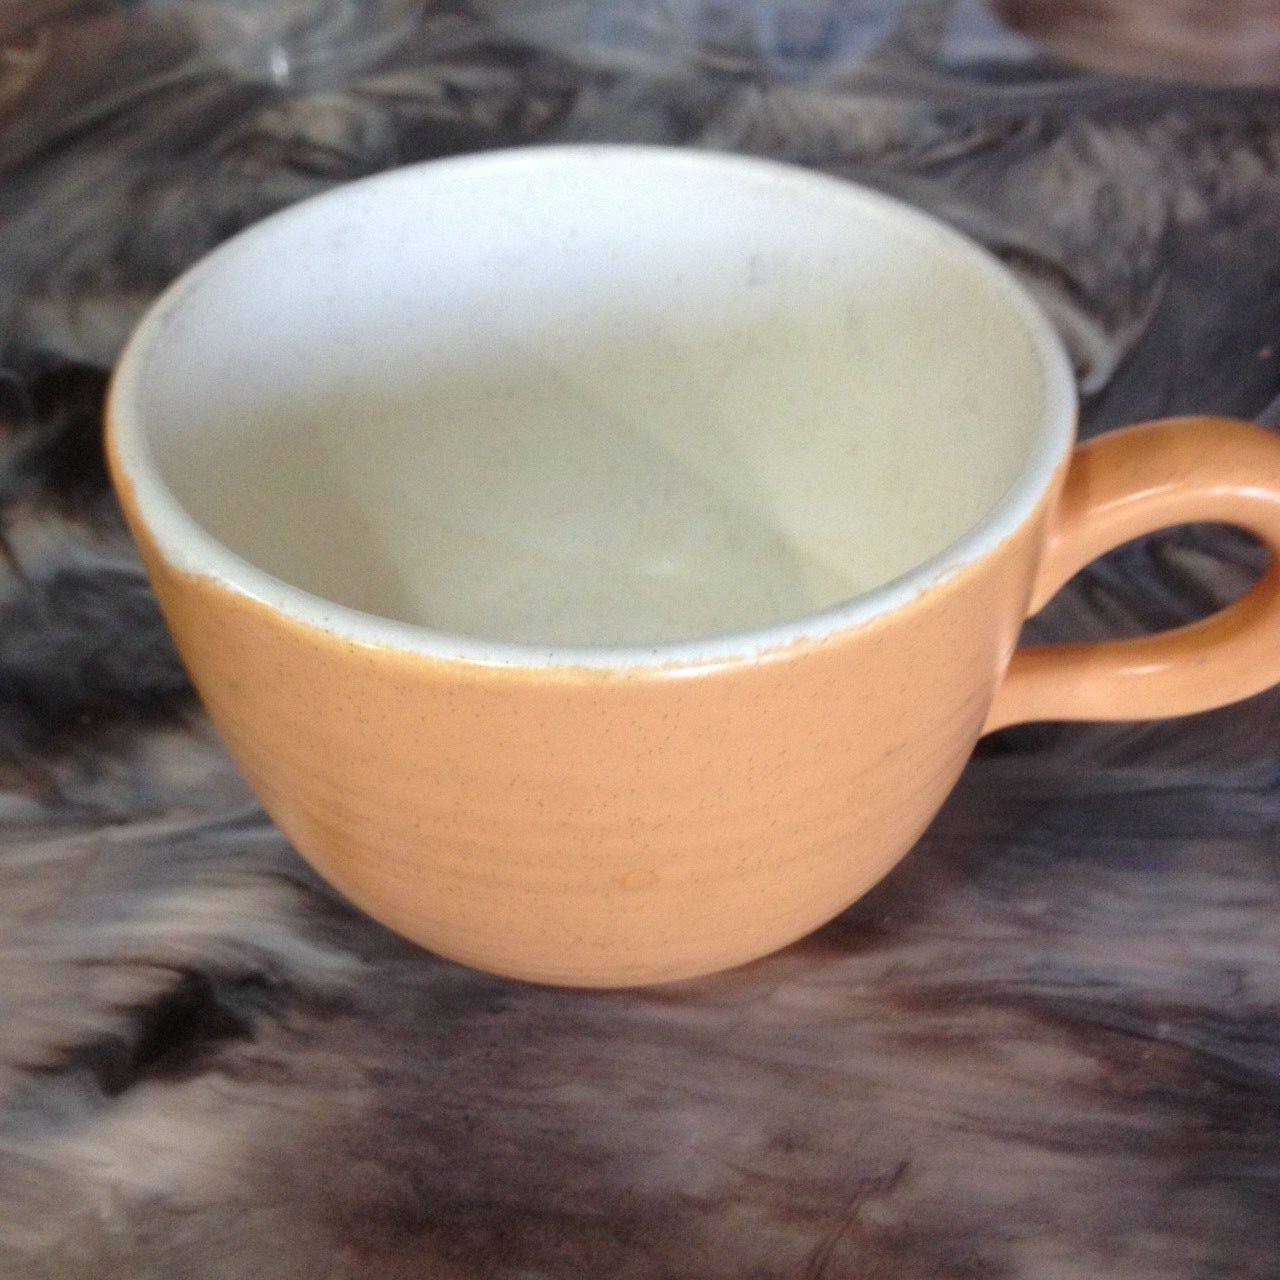 VINTAGE FRANCISCAN EARTHENWARE SIERRA SAND COFFEE CUP - $3.99